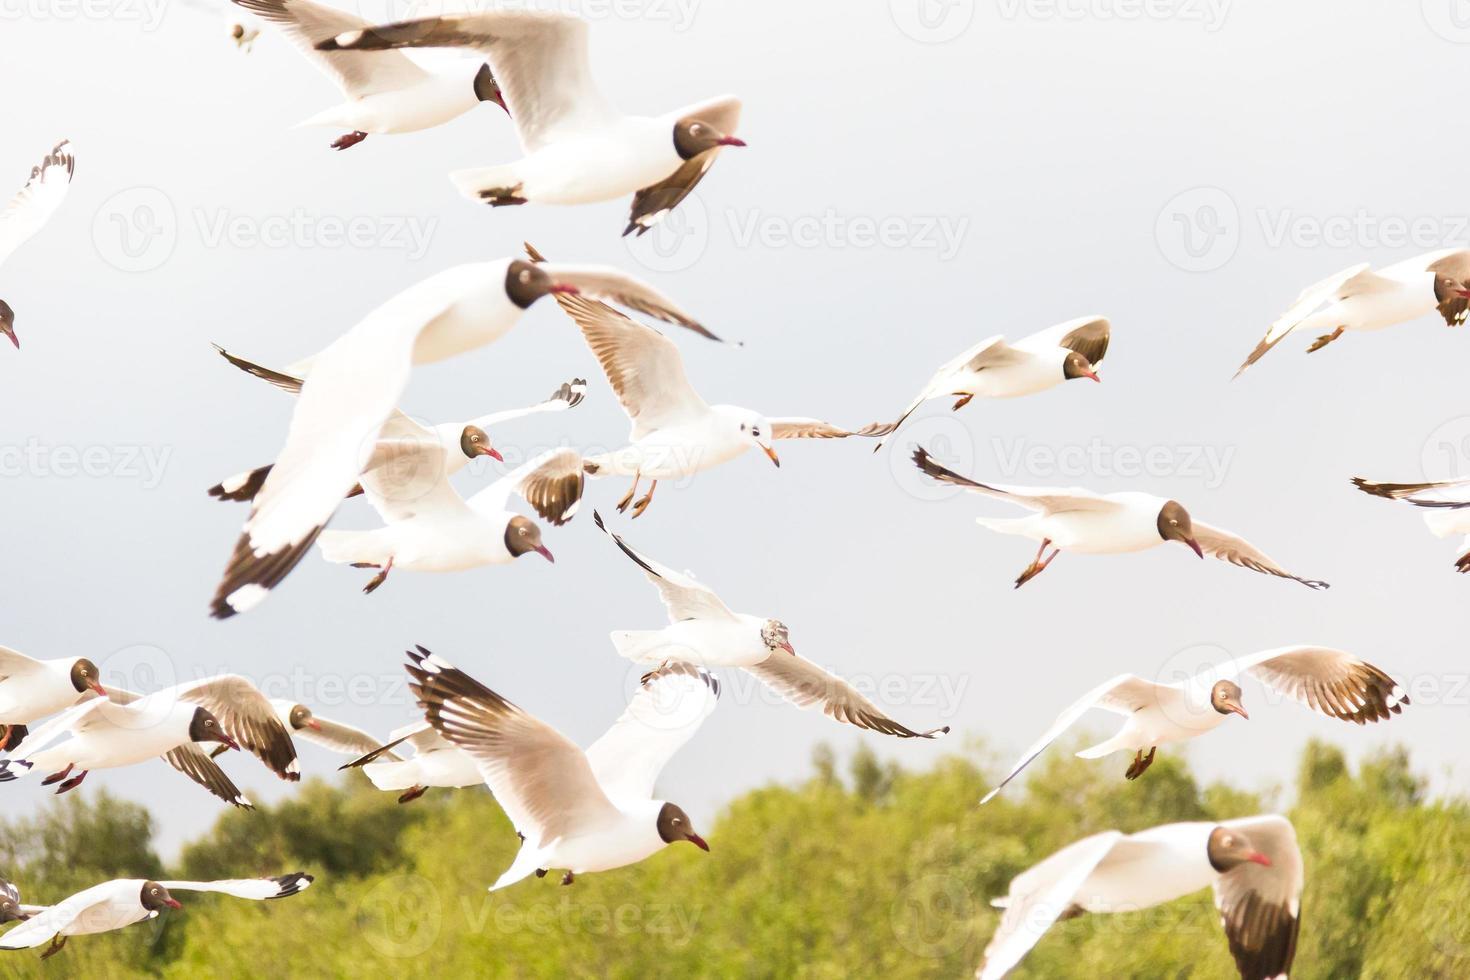 gaivota branca voando no fundo do céu da natureza foto